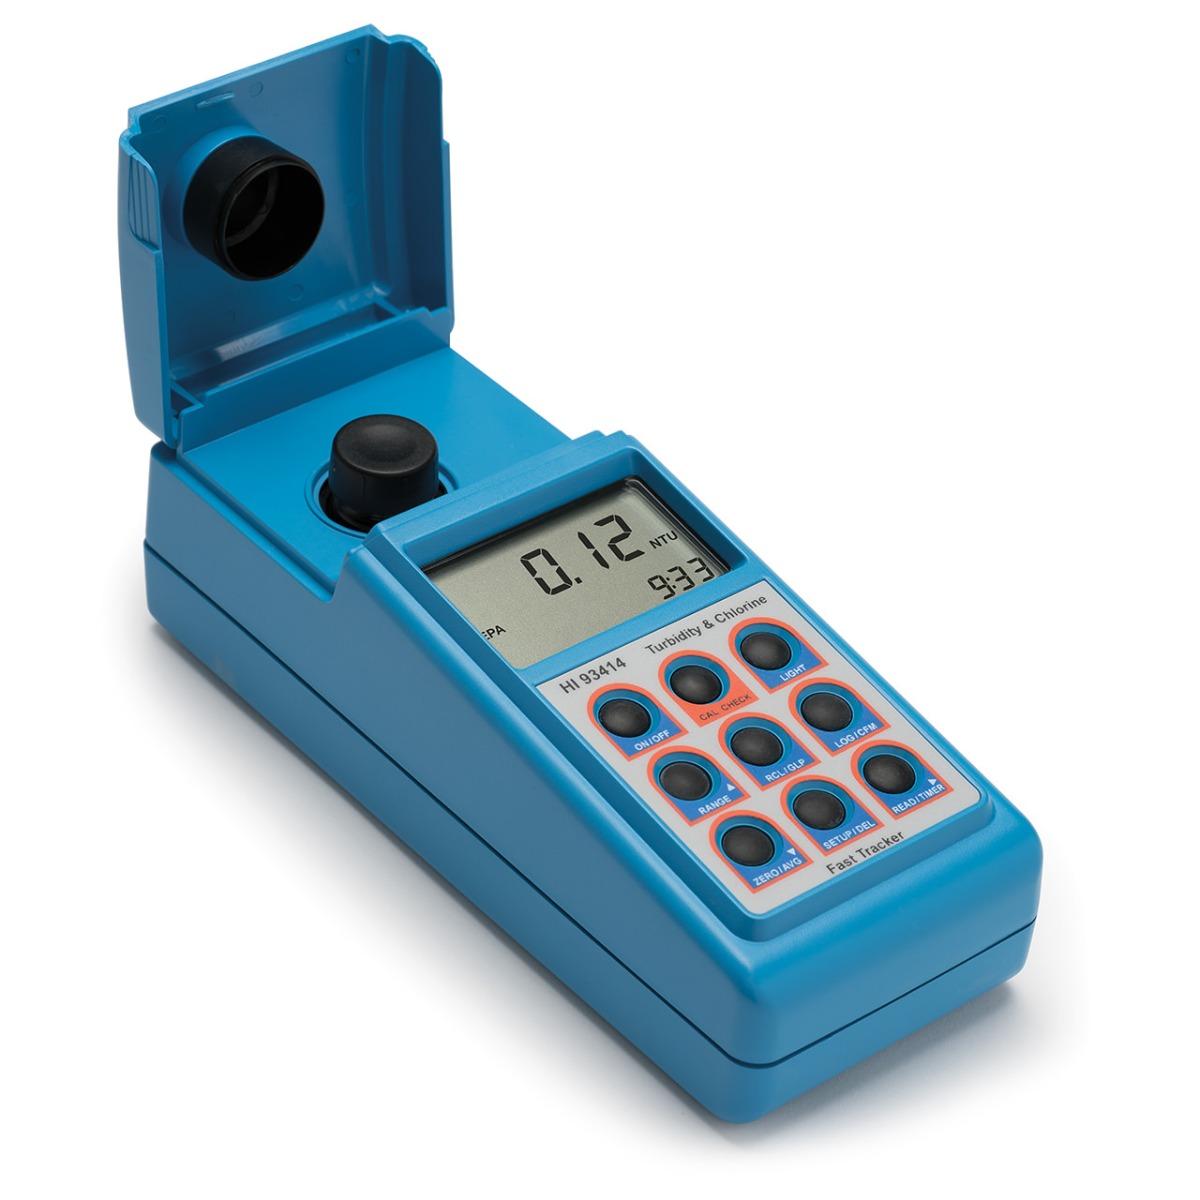 Medidor Portátil para Cloro y Turbidez (EPA) - HI93414-02